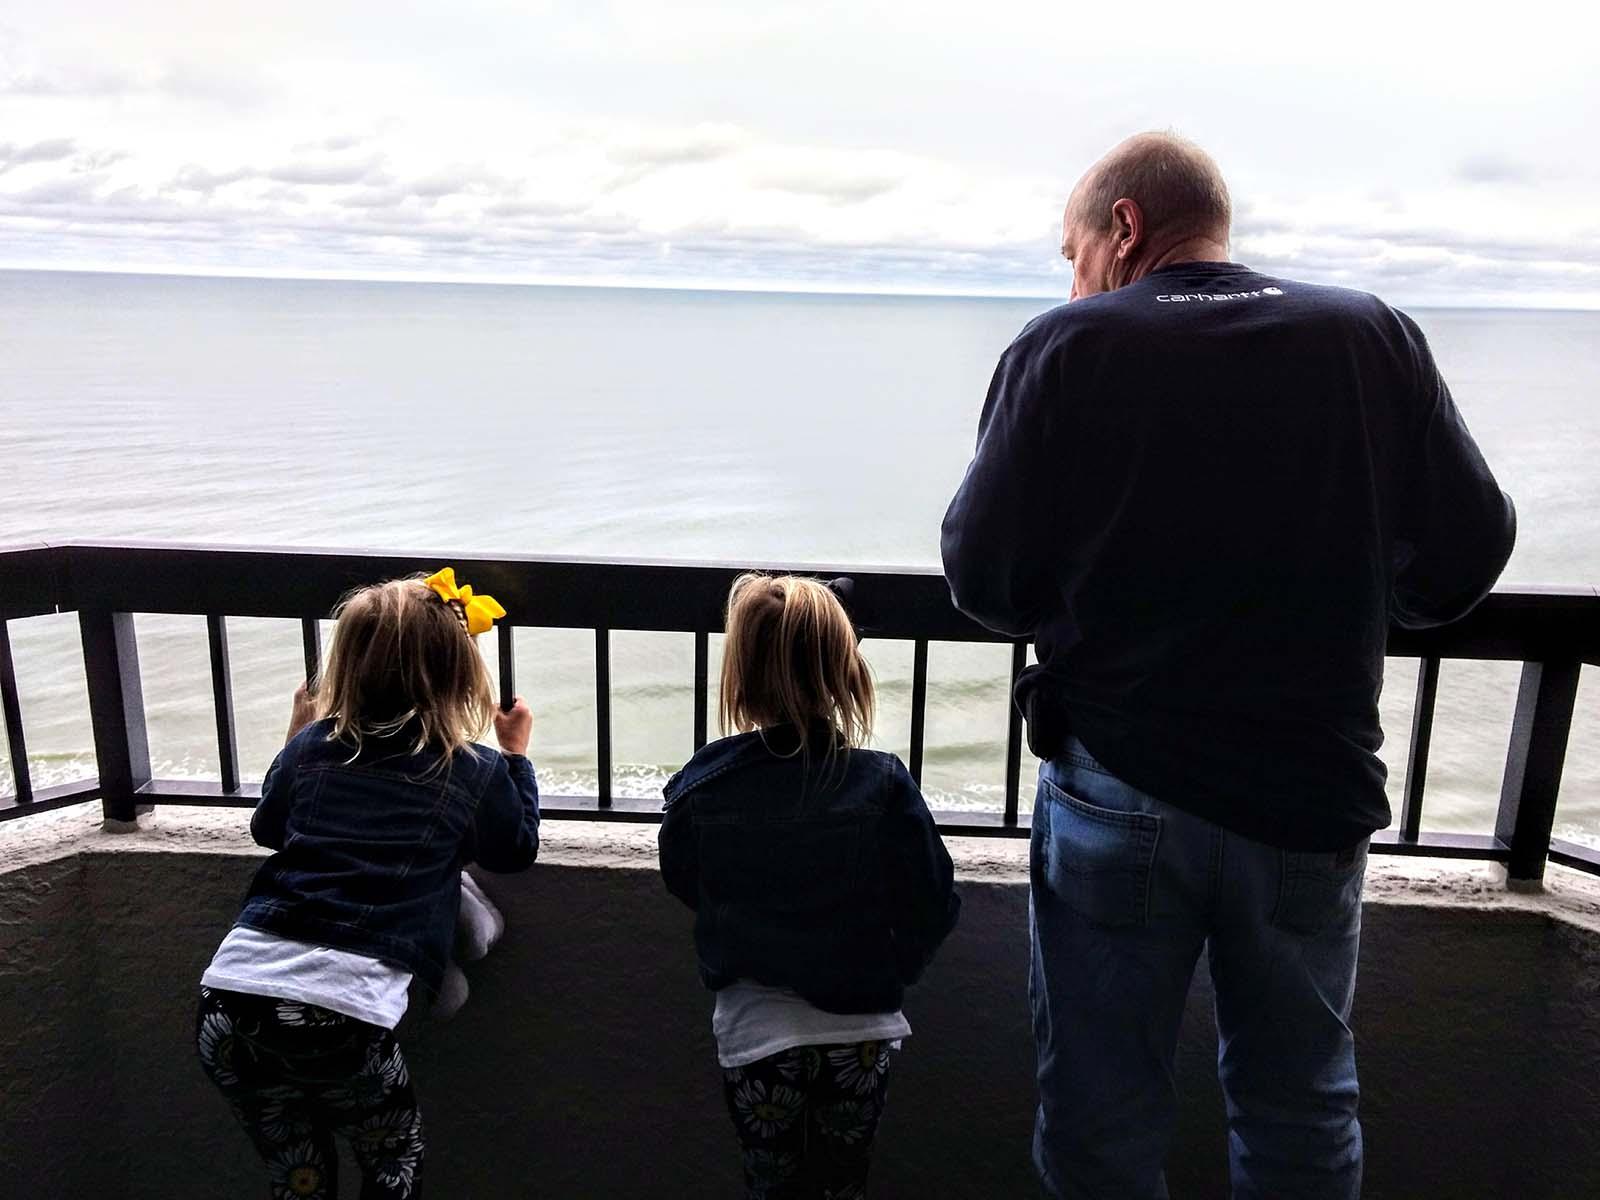 Grandpa with two grandkids on balcony